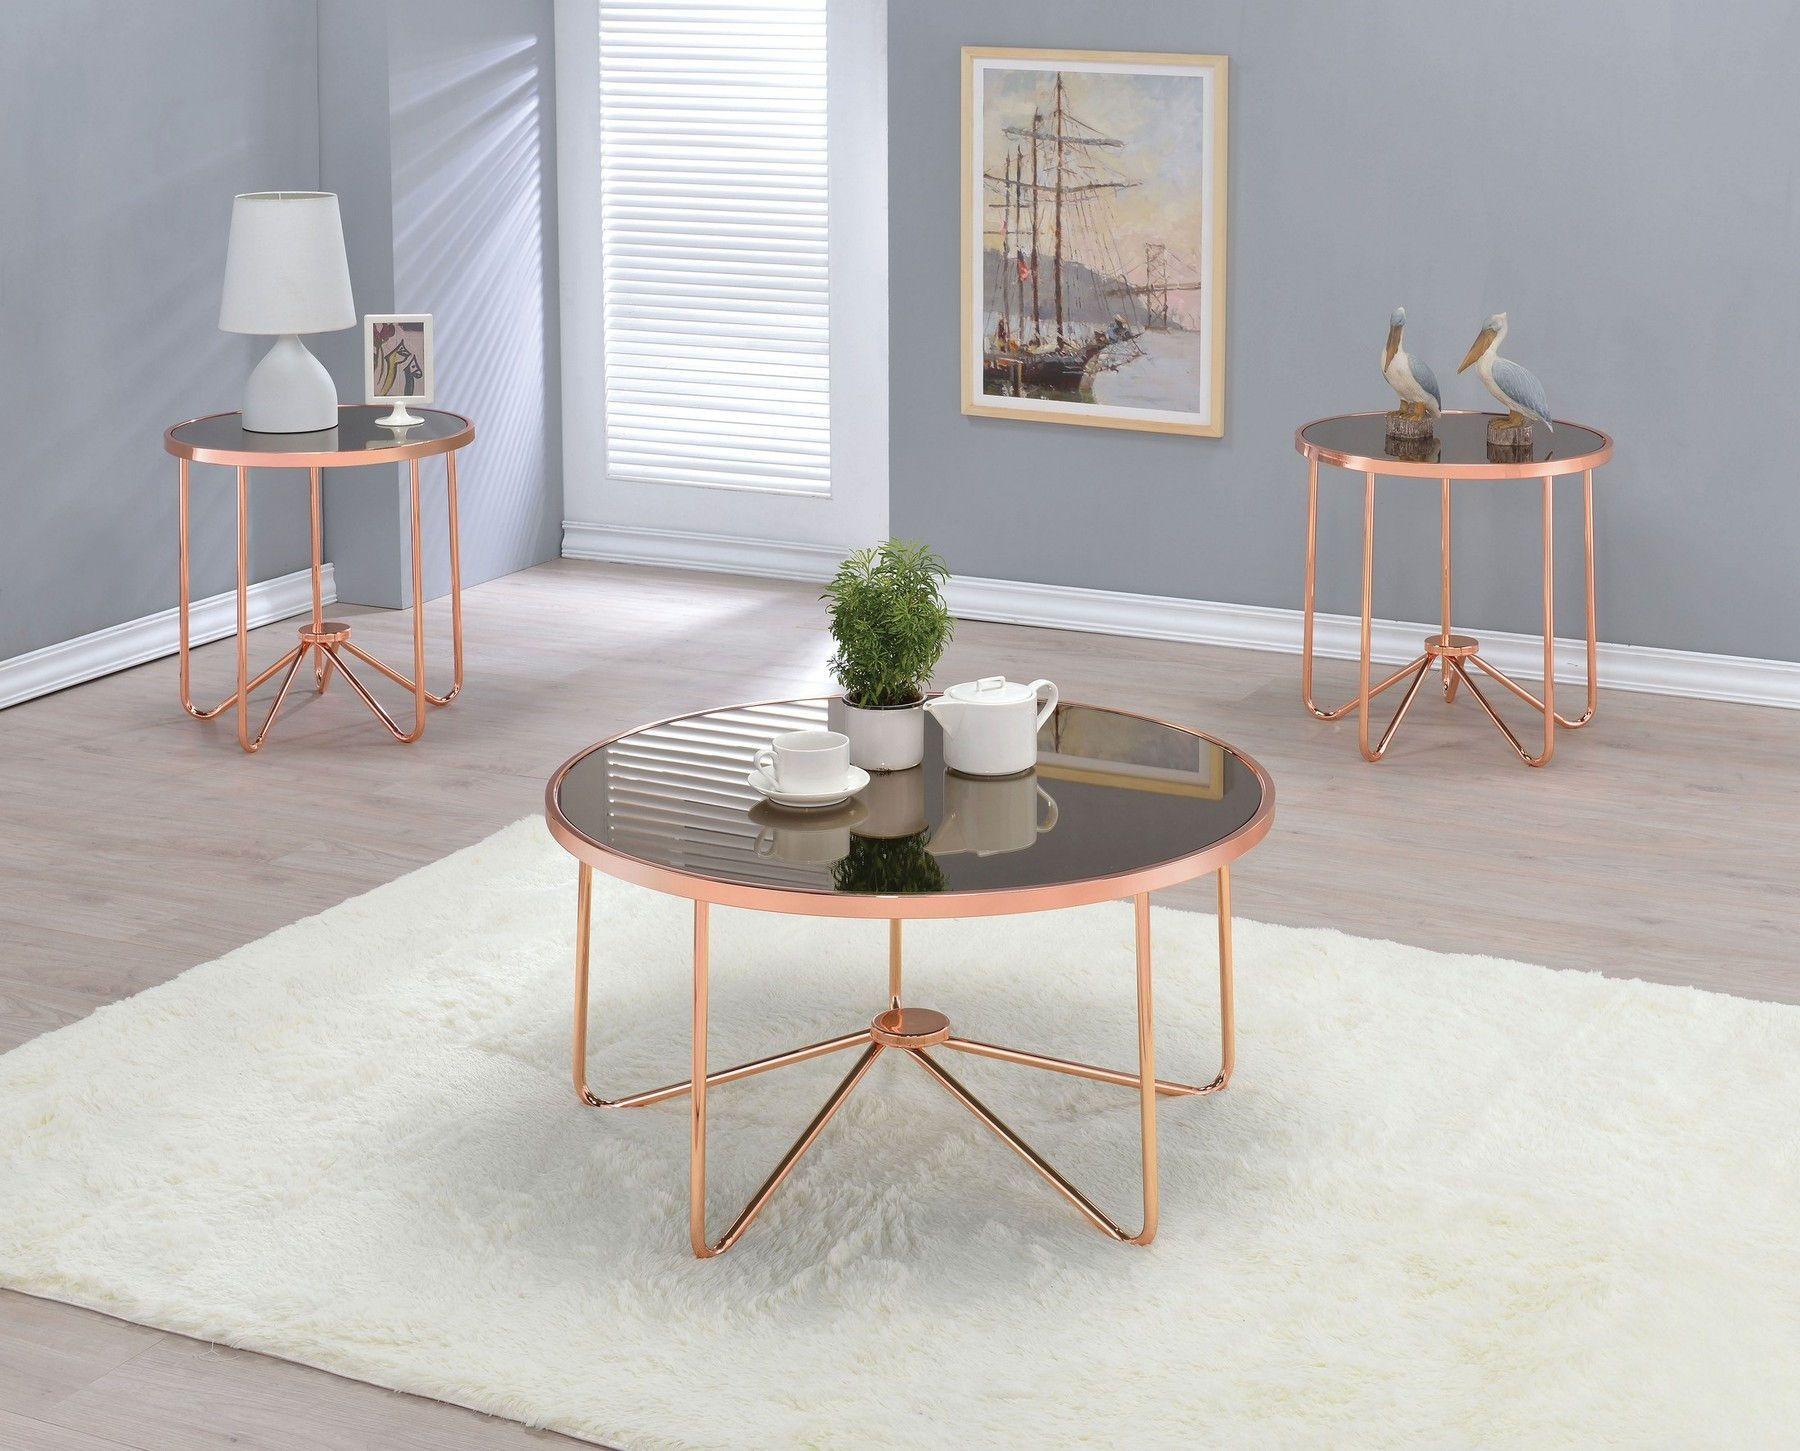 Alivia Coffee Table 81840 Acme Corporation Coffee Tables Gold Coffee Table Coffee Table Rose Gold Coffee Table [ 1451 x 1800 Pixel ]